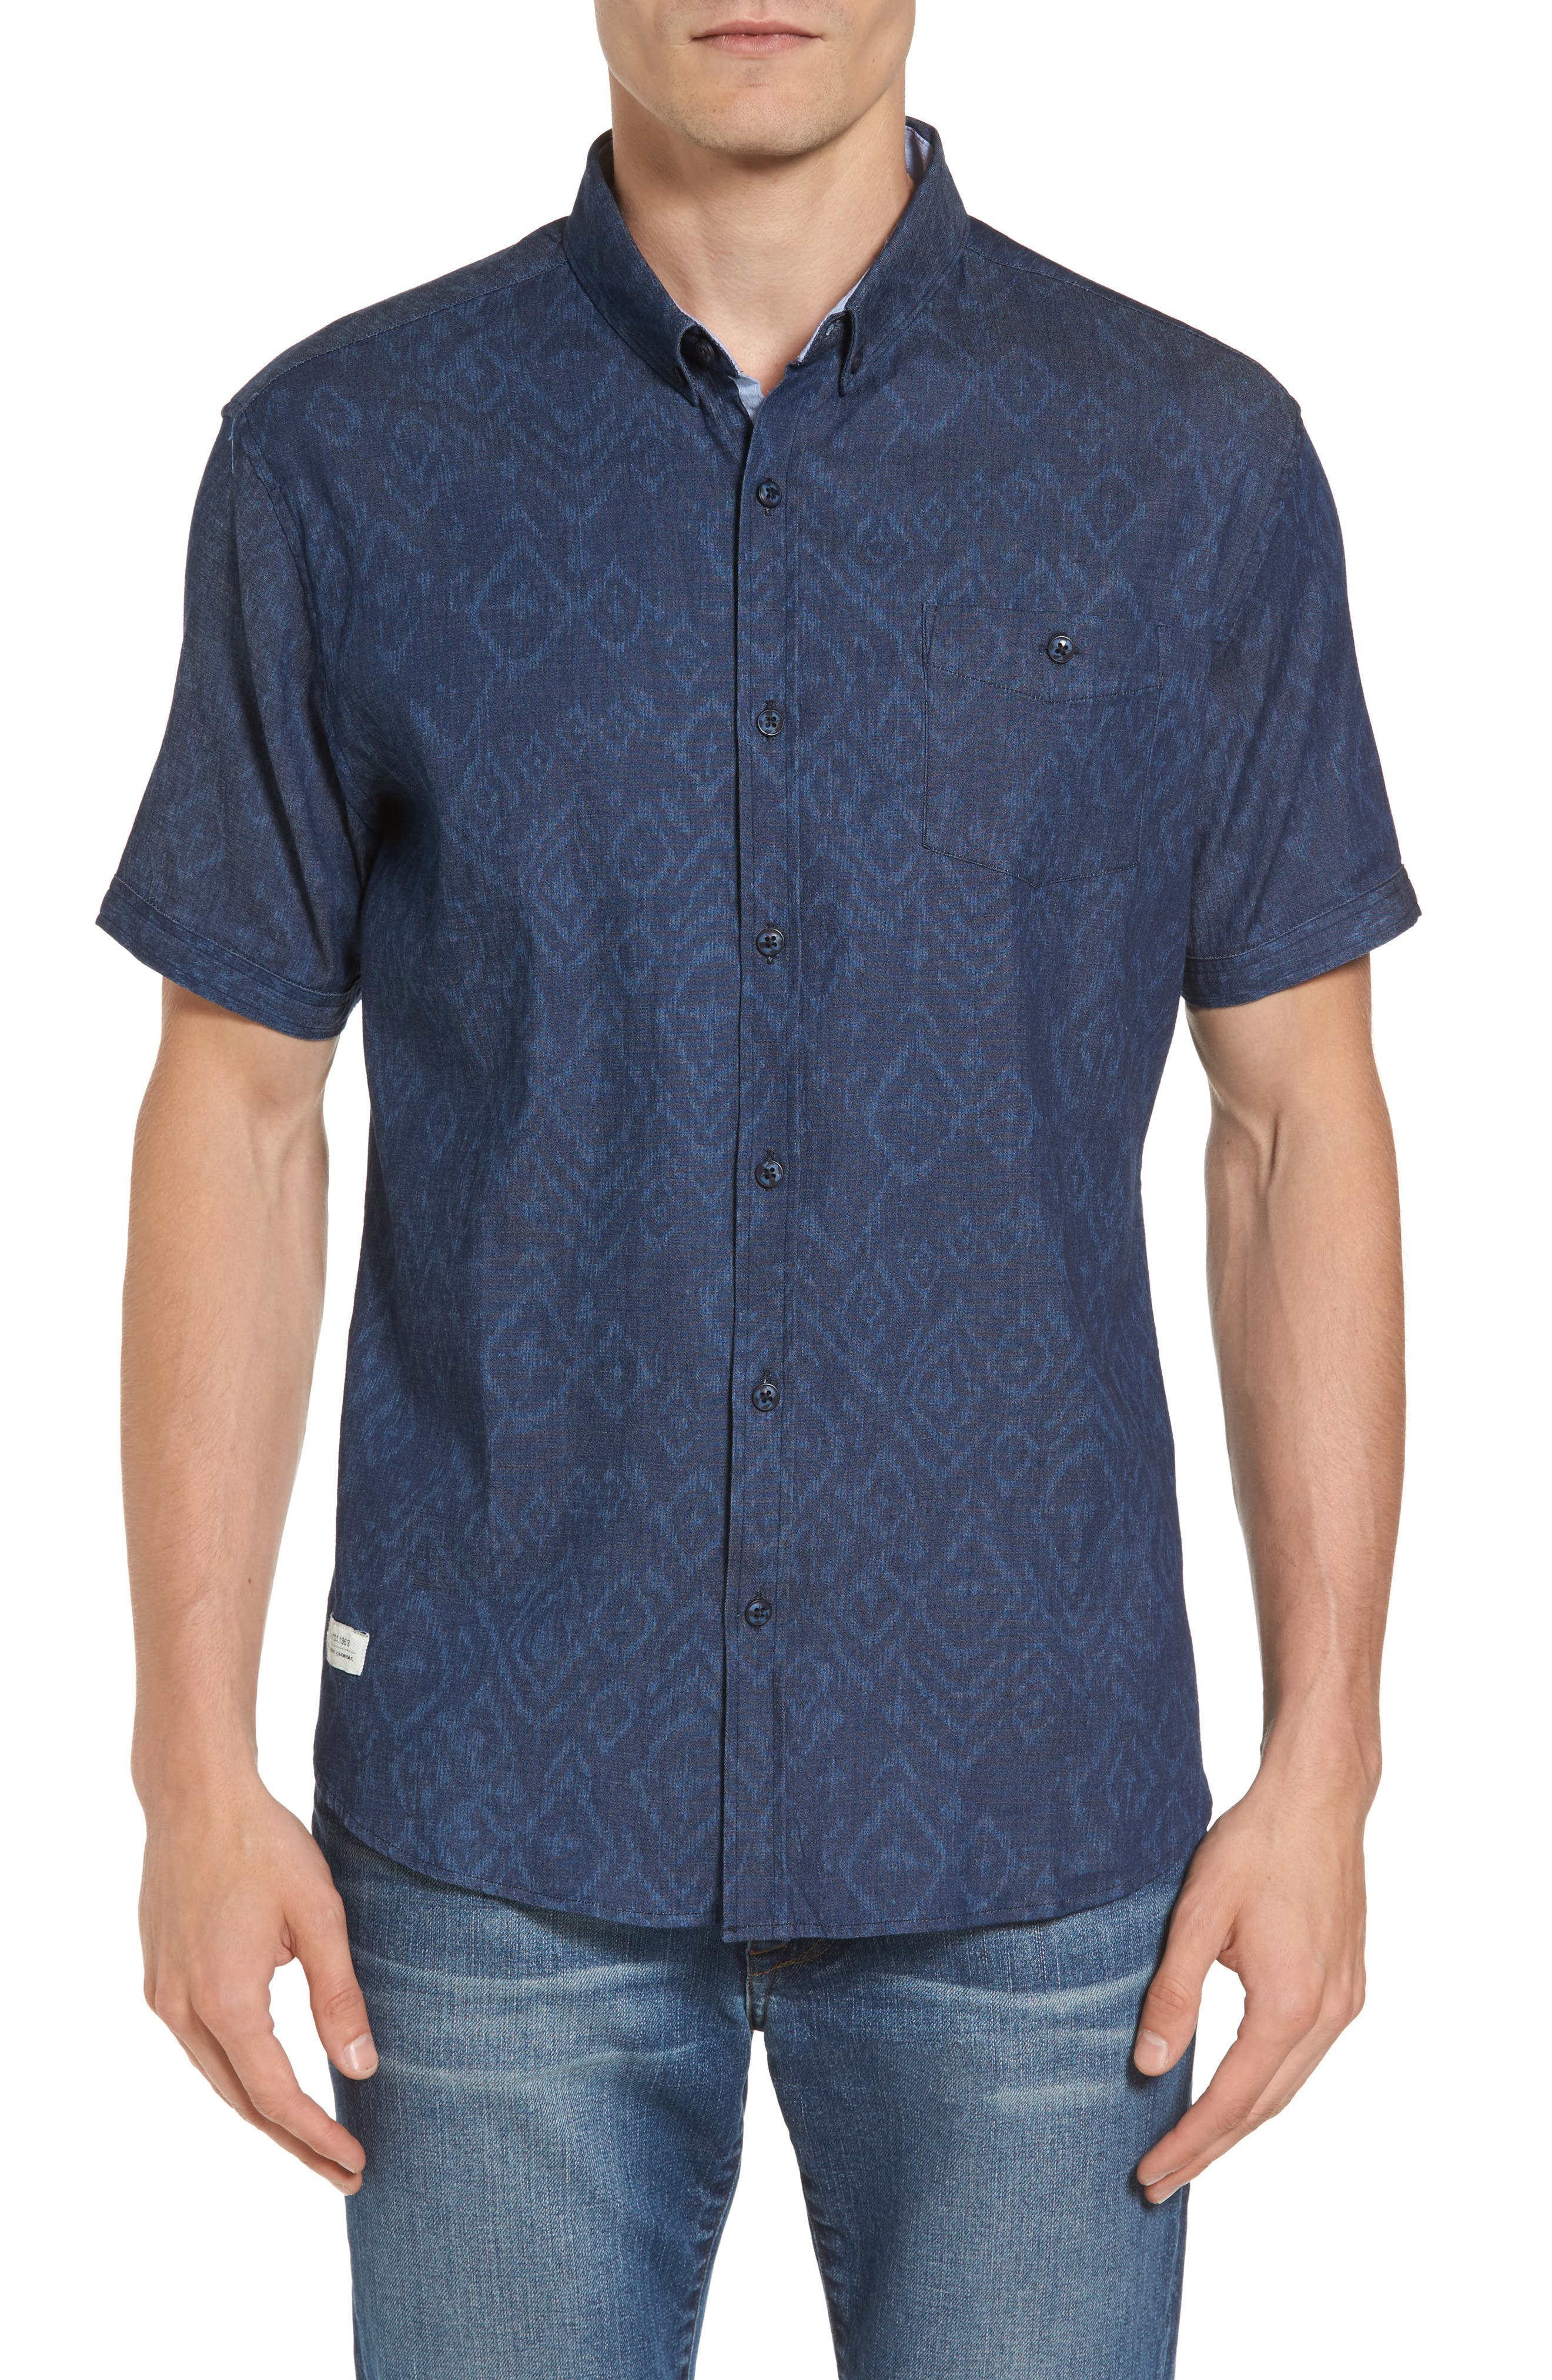 Marquee Moon Print Woven Shirt,                             Main thumbnail 1, color,                             410